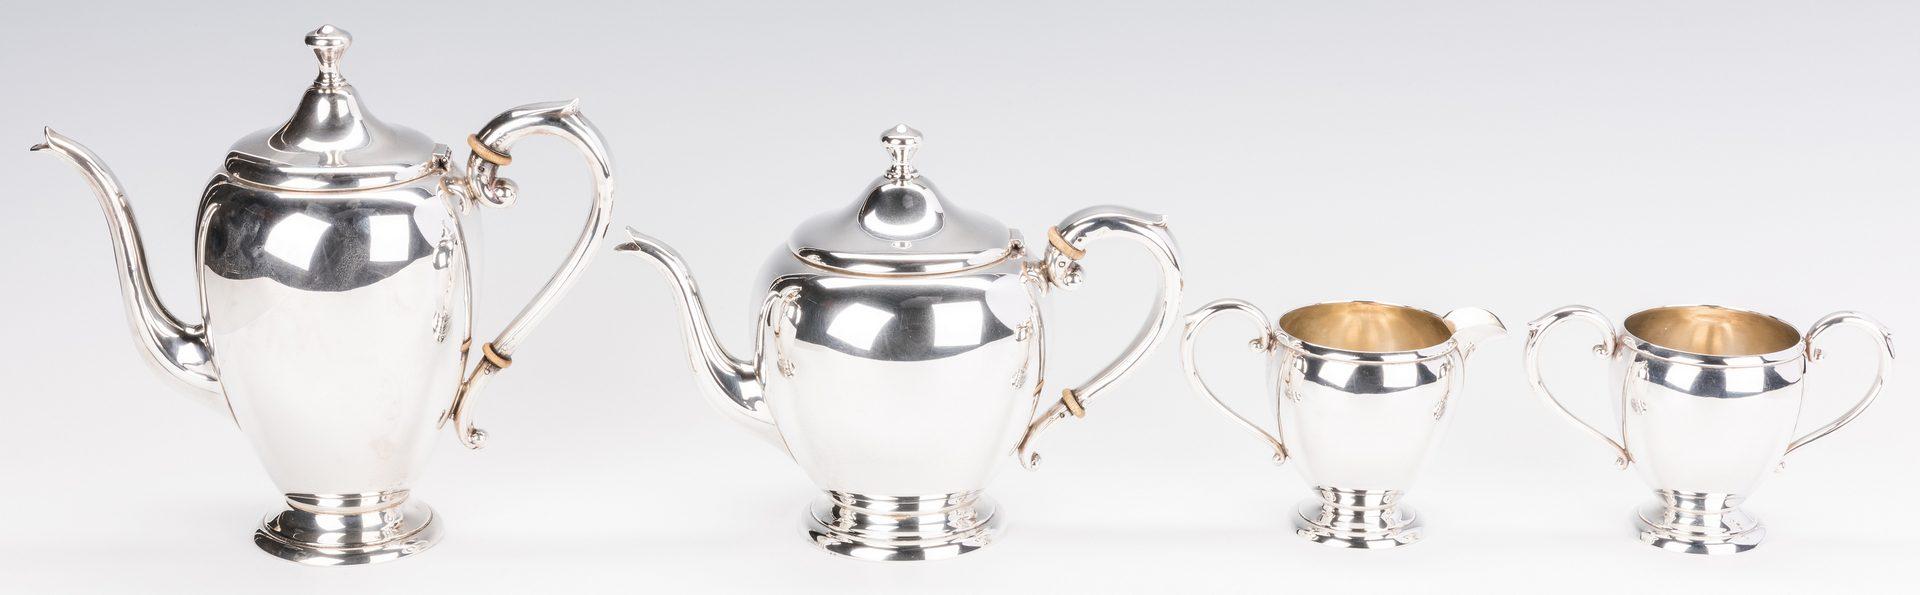 Lot 867: 4 pc. Sterling Silver Tea Set